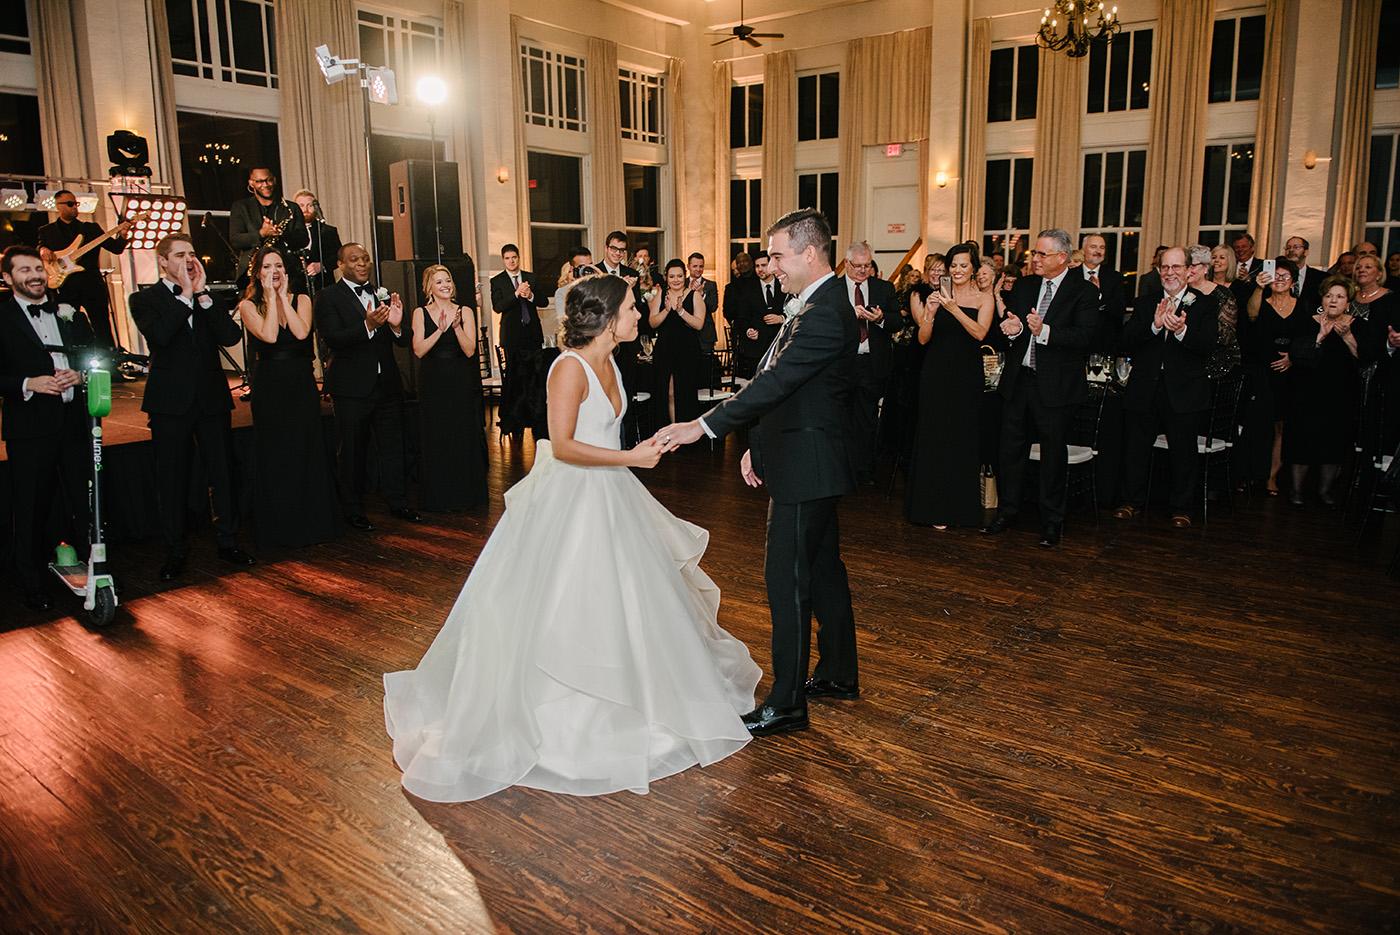 Dallas Wedding Planner - Winter Wedding at The Room on Main - Allday Events - 56.jpg